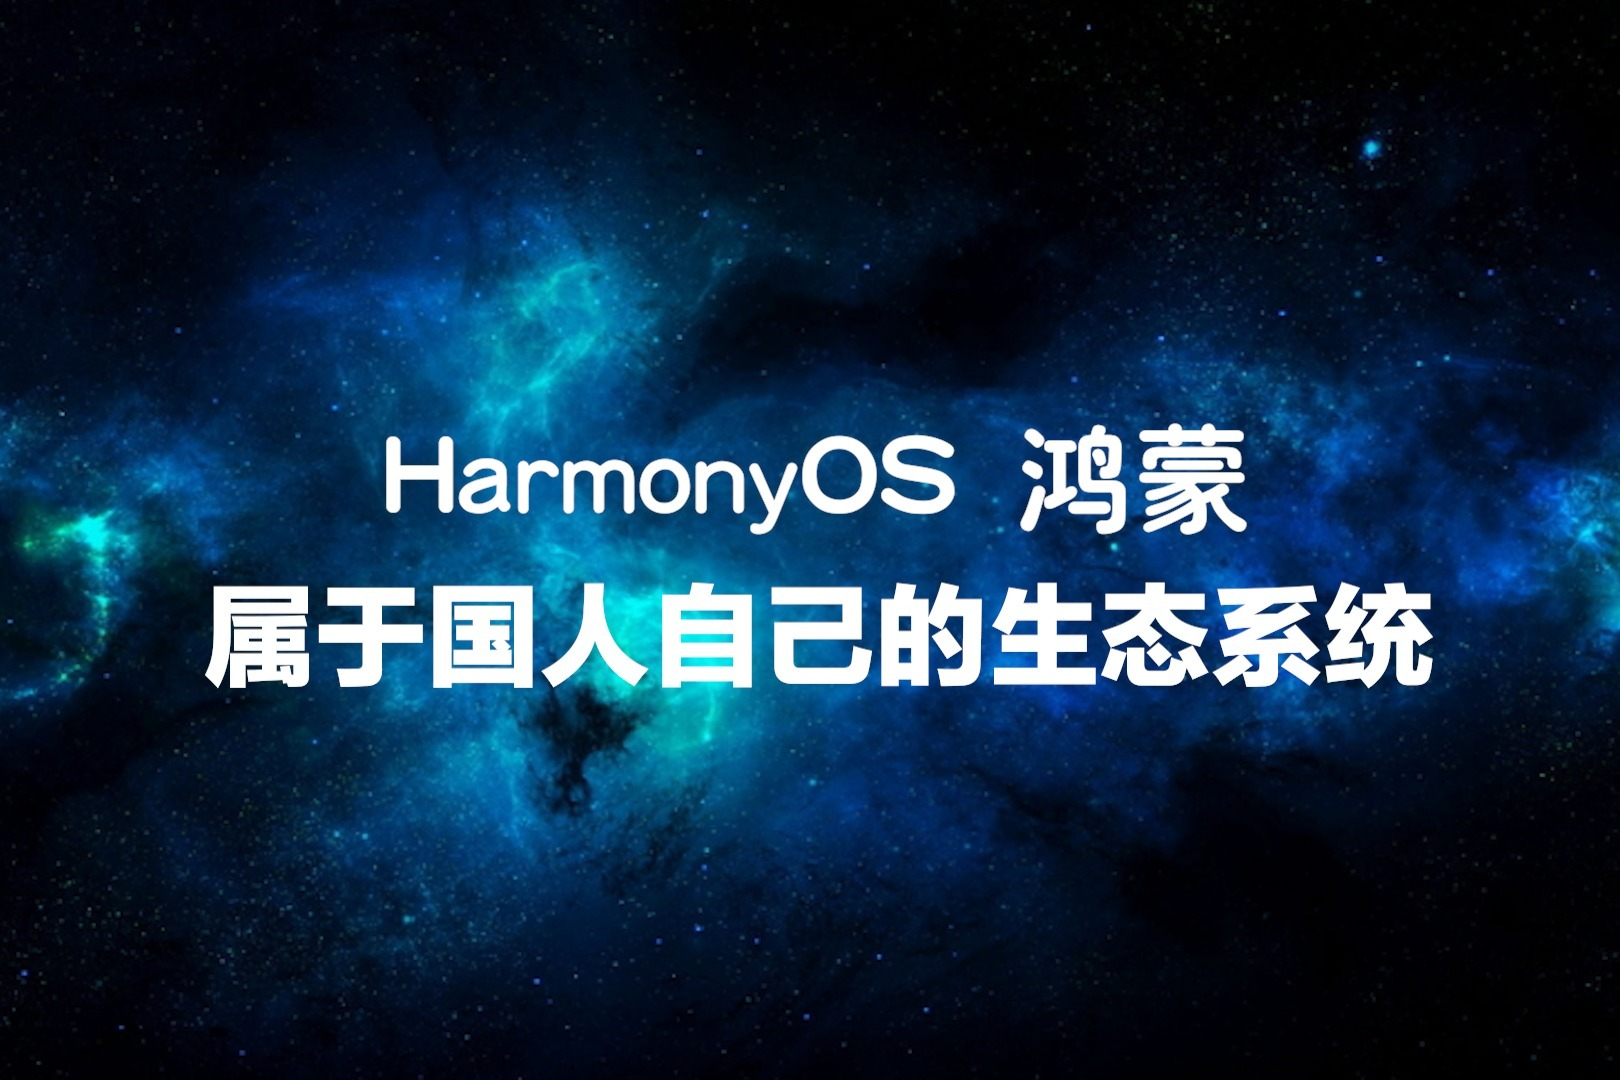 HarmonyOS 鸿蒙,属于国人自己的生态系统